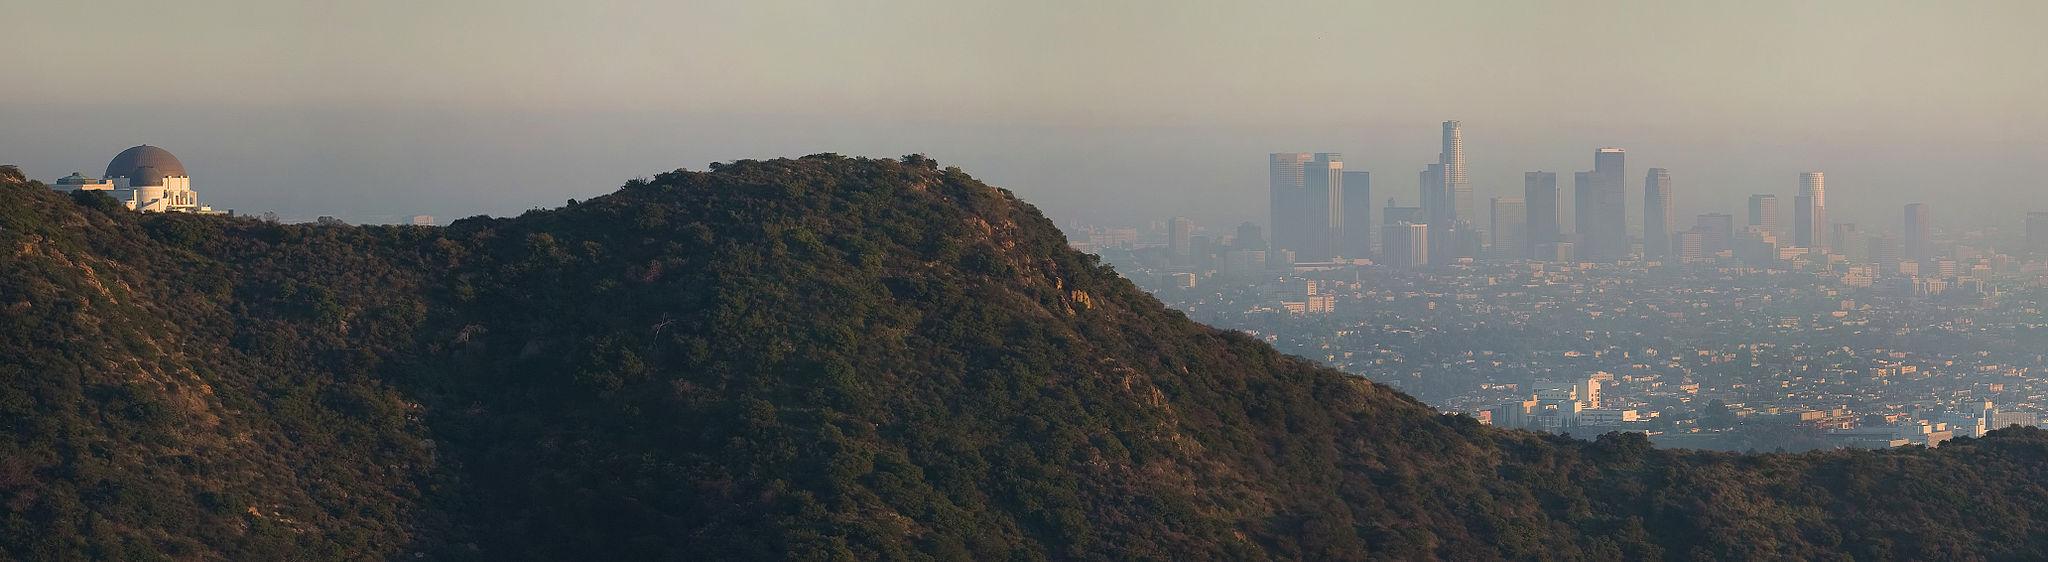 Top Attractions To Explore In Los Angeles